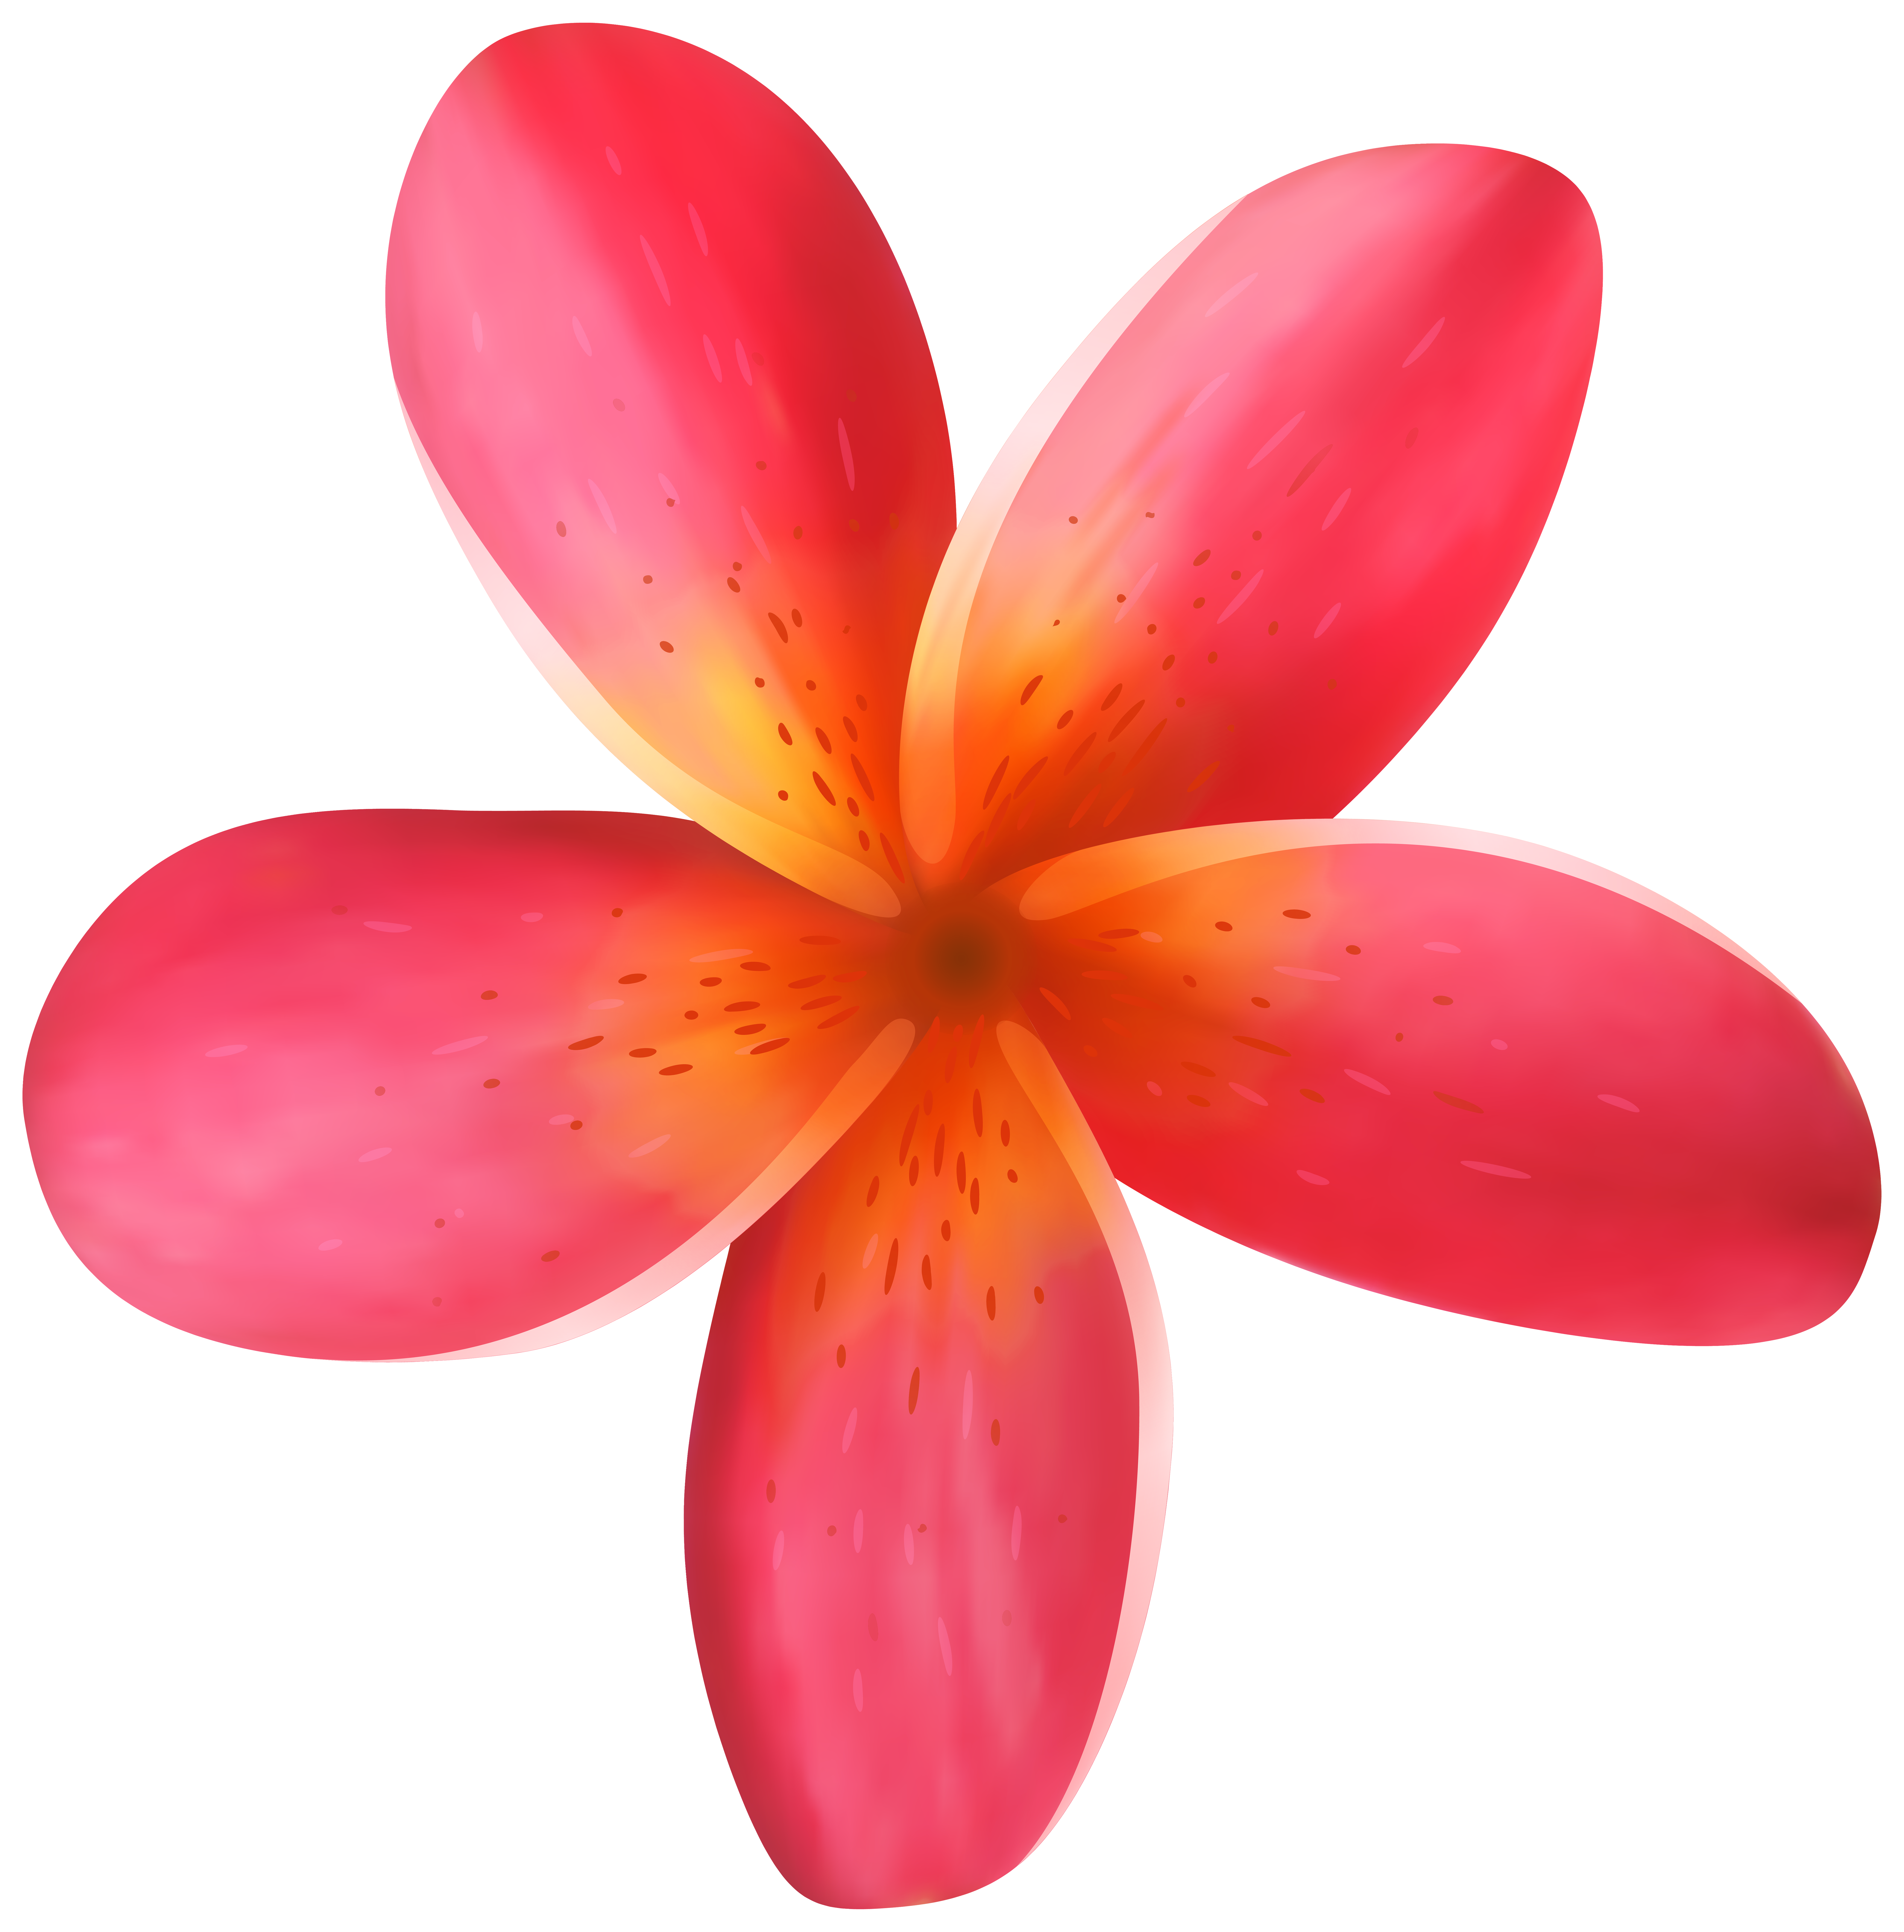 7884x8000 Tropical Flower Png Clip Art Imageu200b Gallery Yopriceville